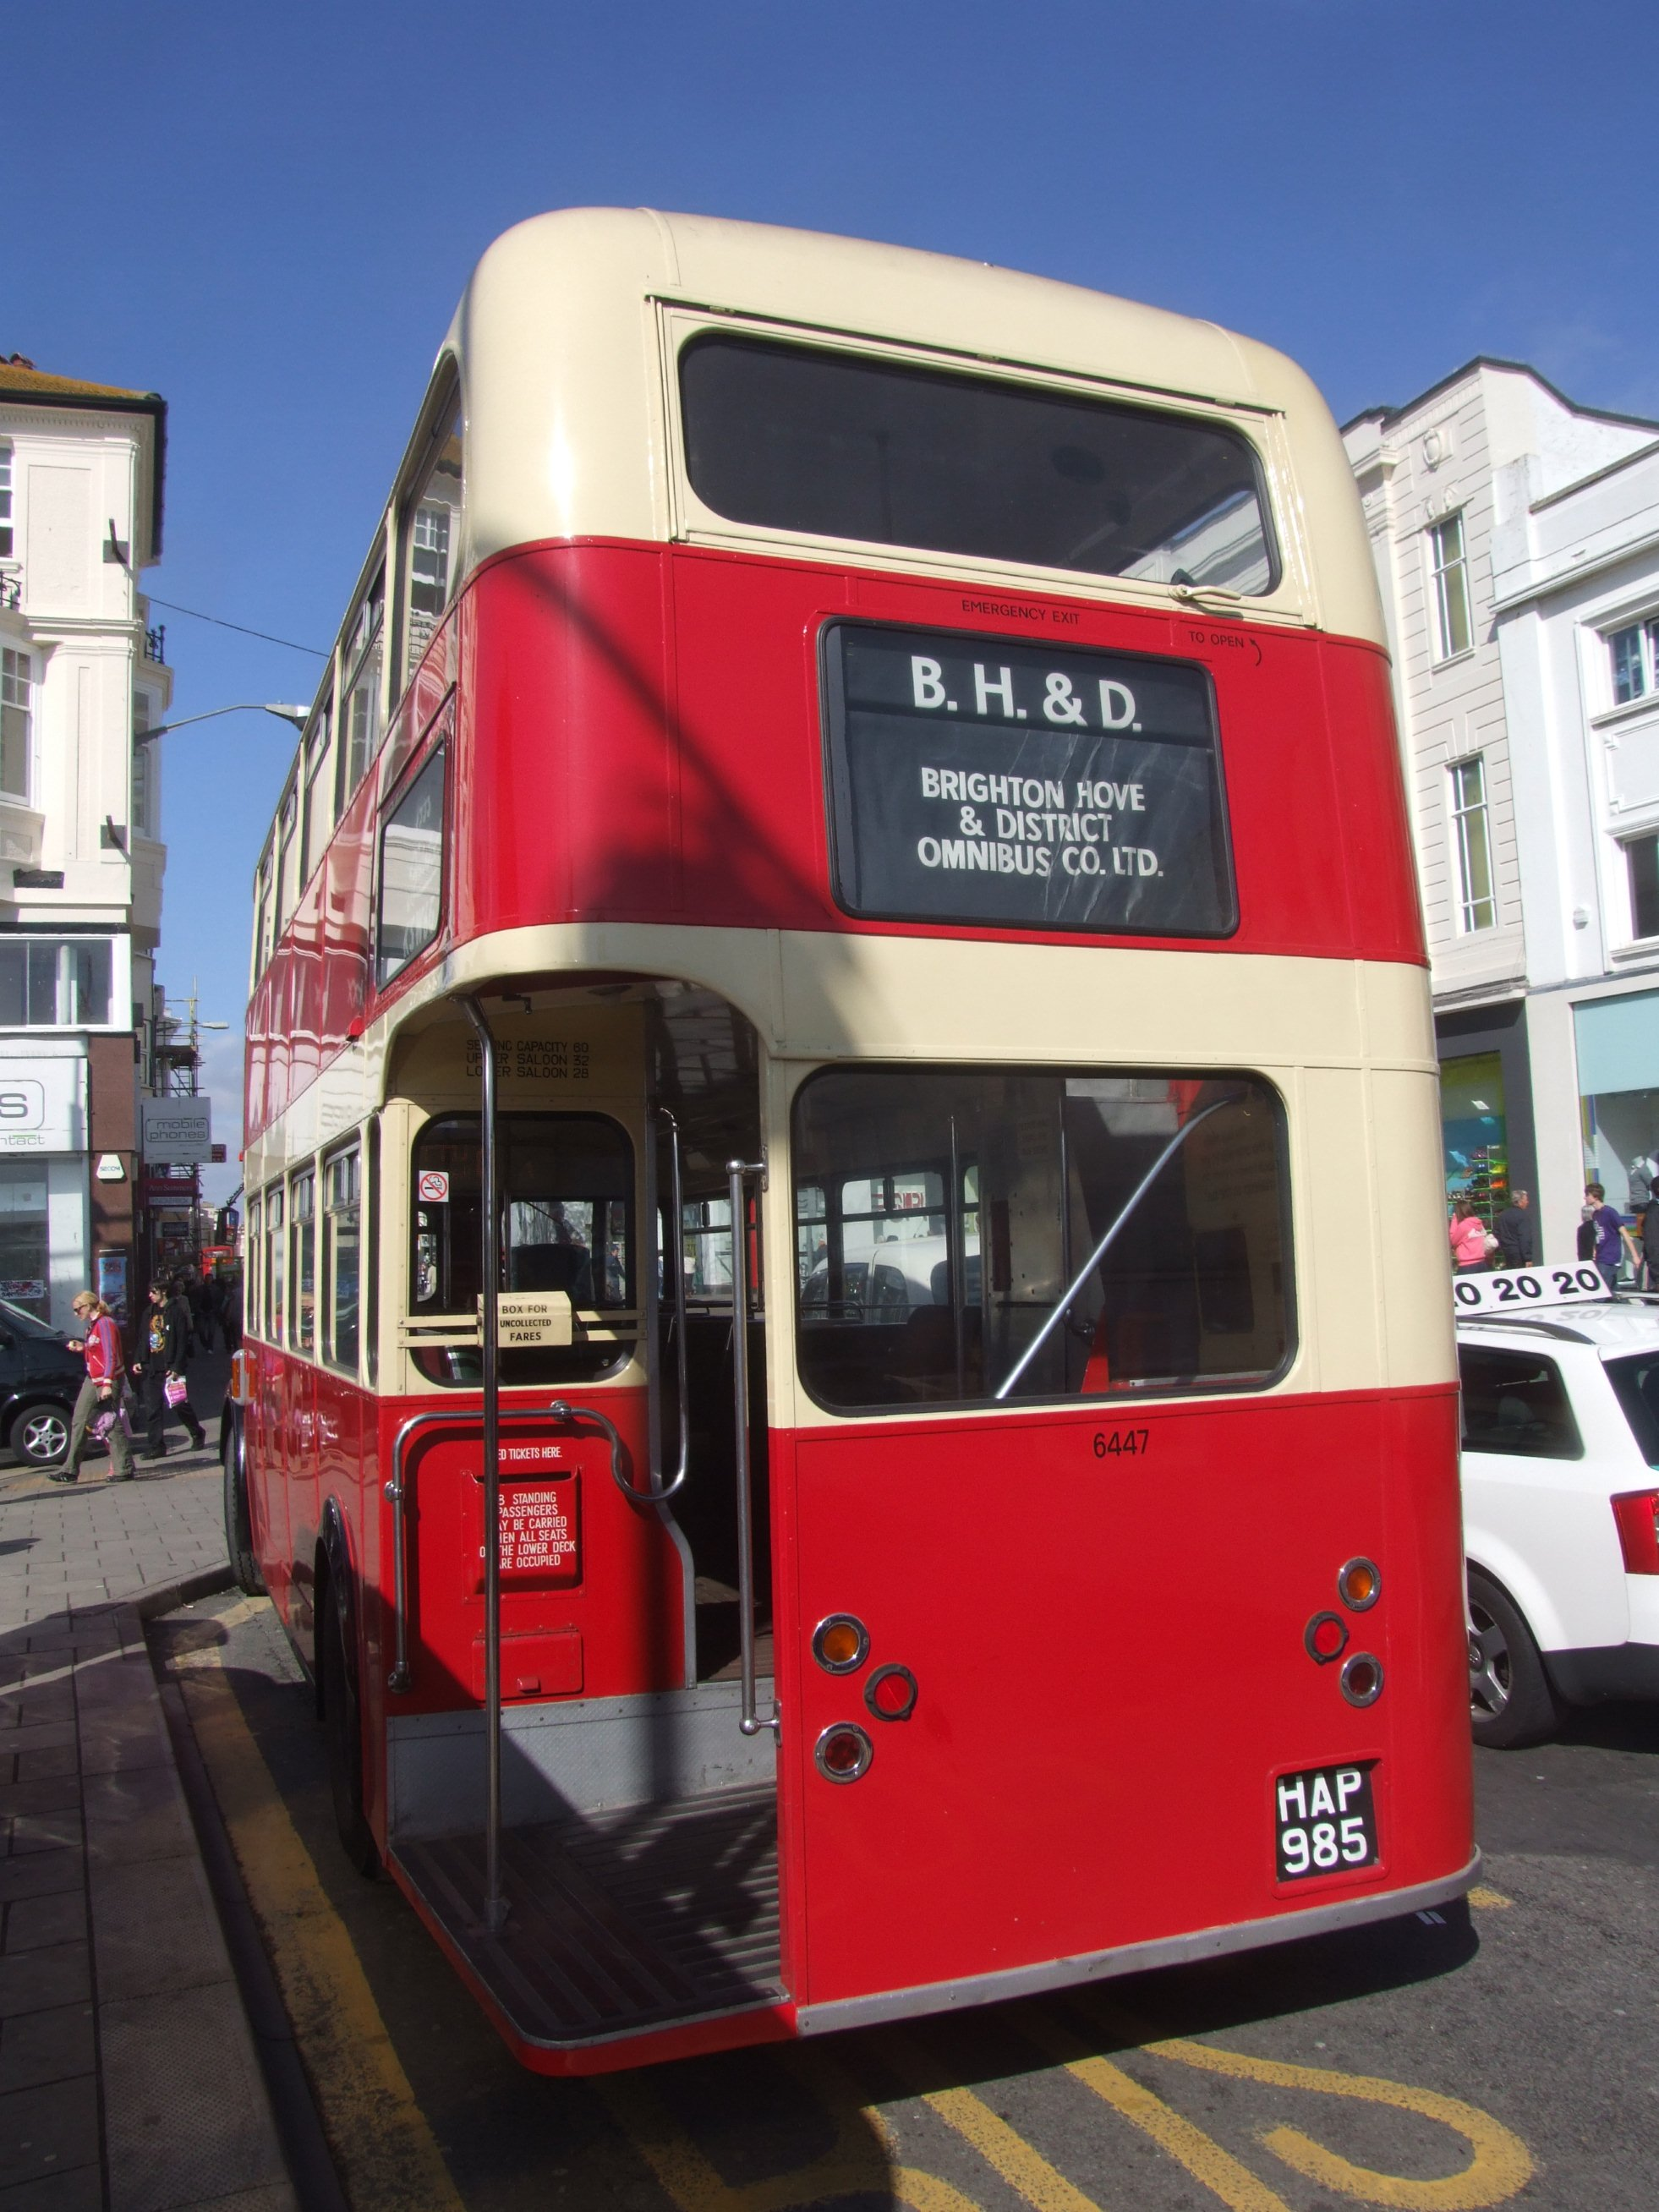 FileBrighton Hove Bus 6447 HAP 985 8 April 2009